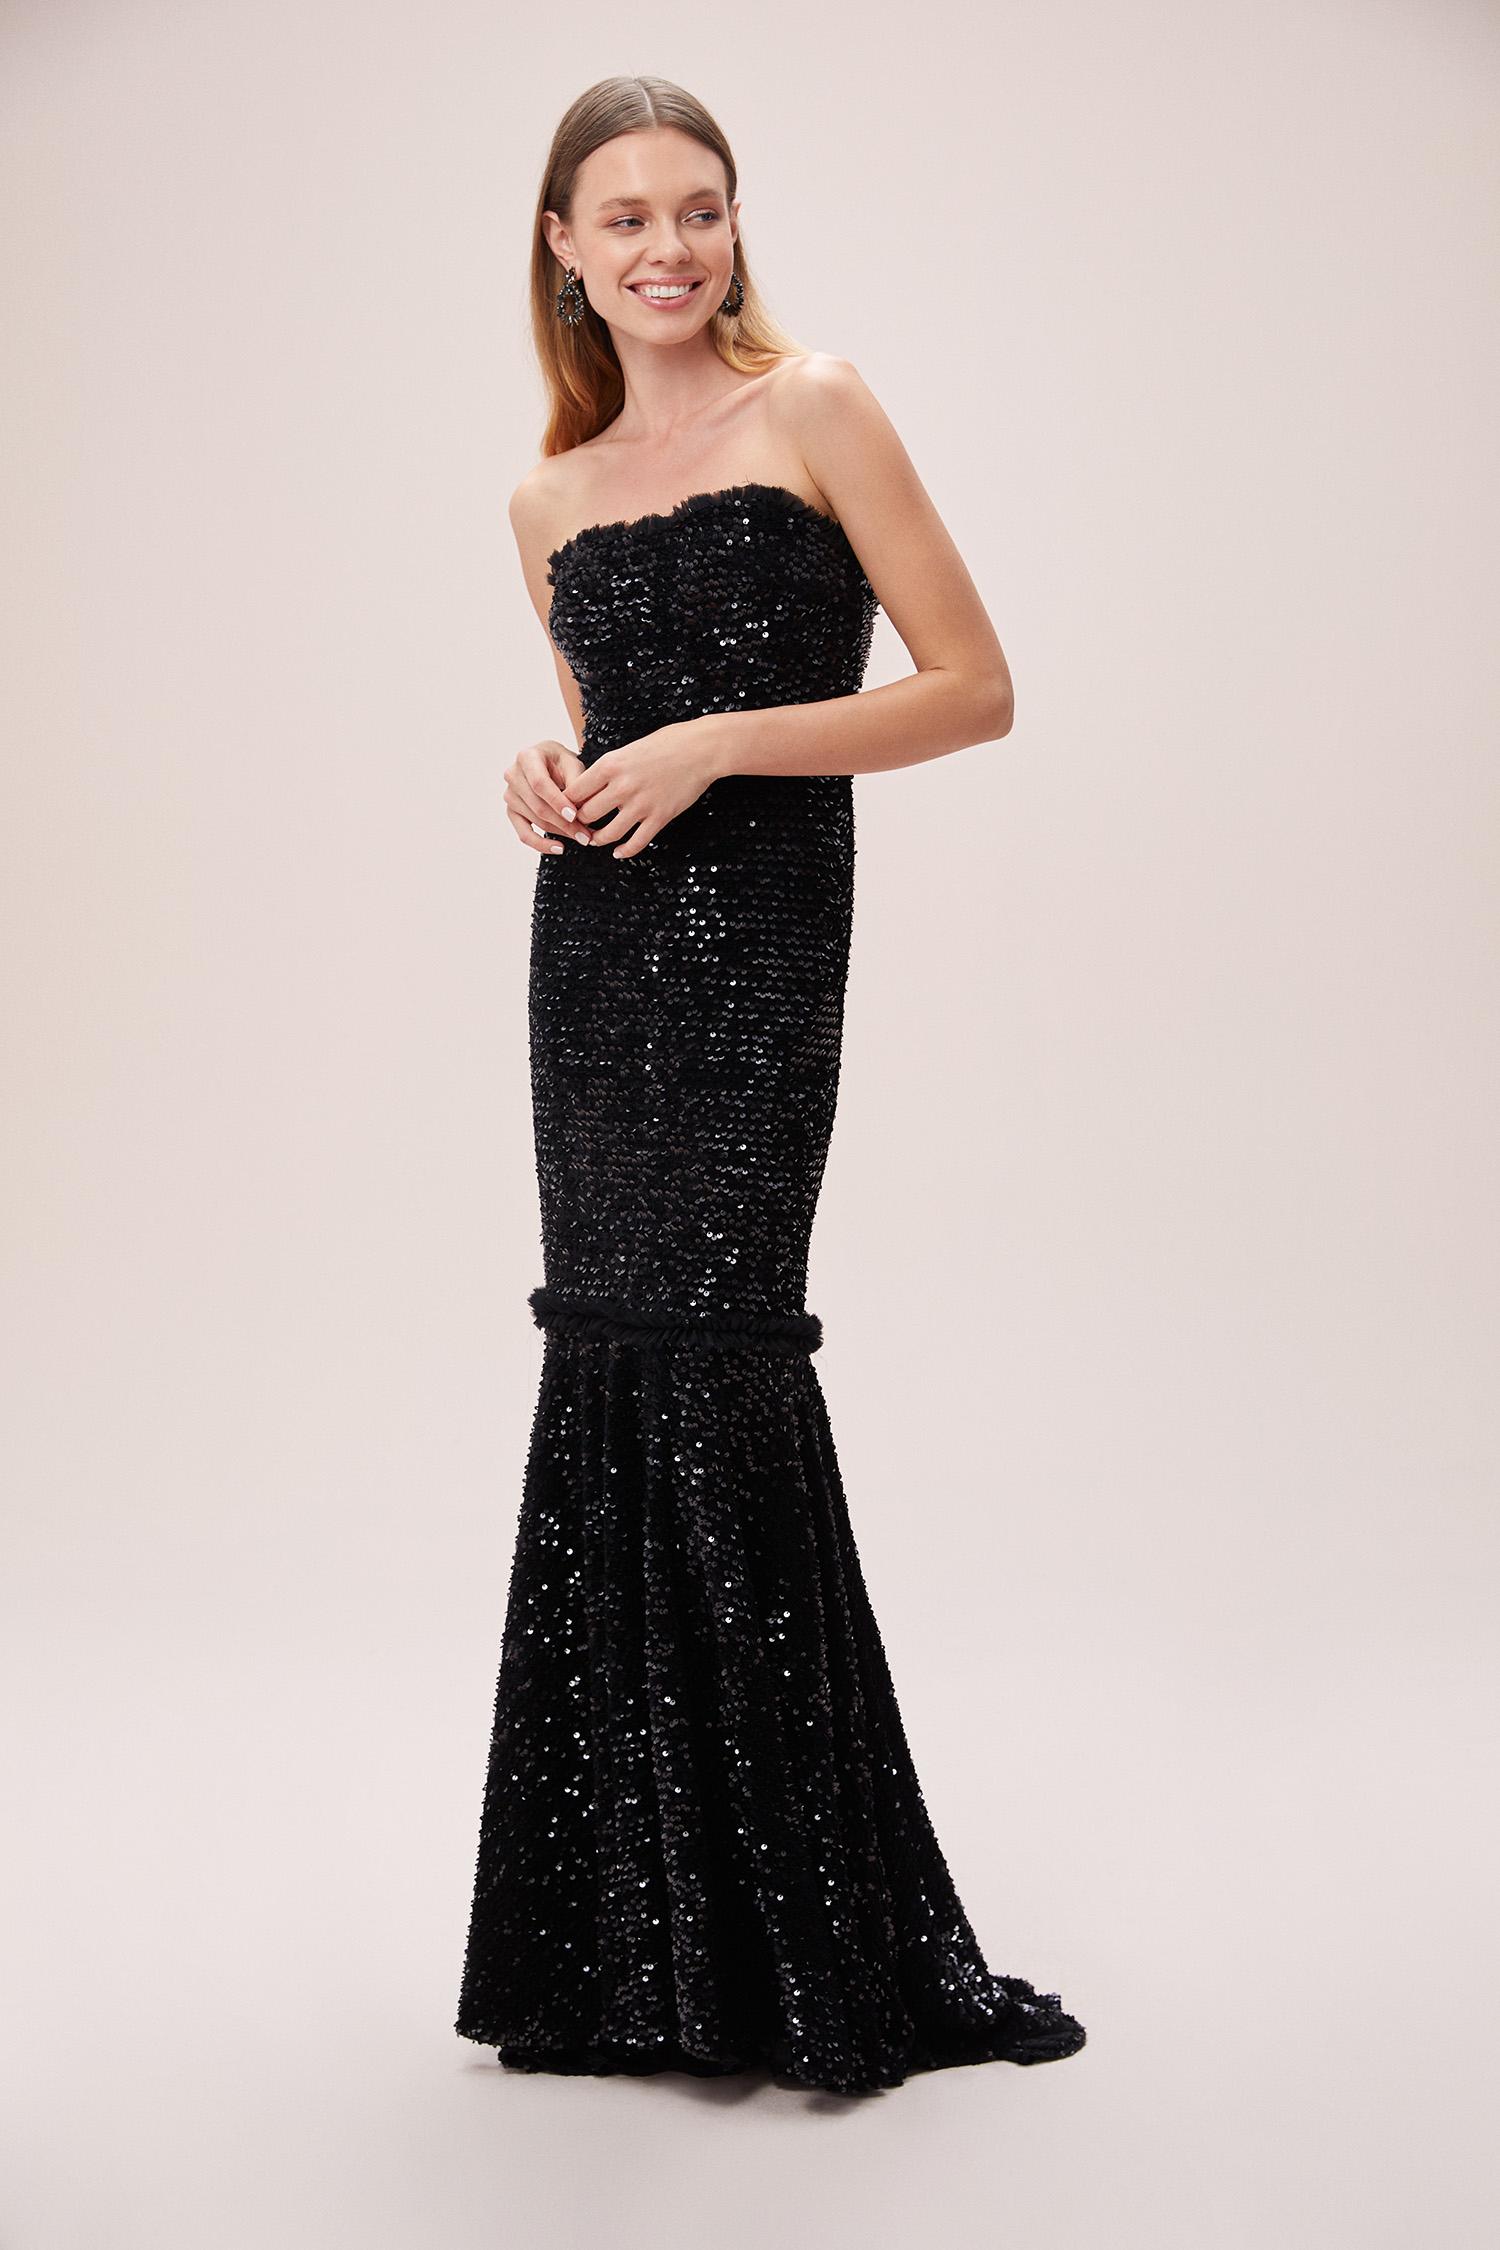 Siyah Straplez Payetli Kadife Uzun Elbise - Thumbnail